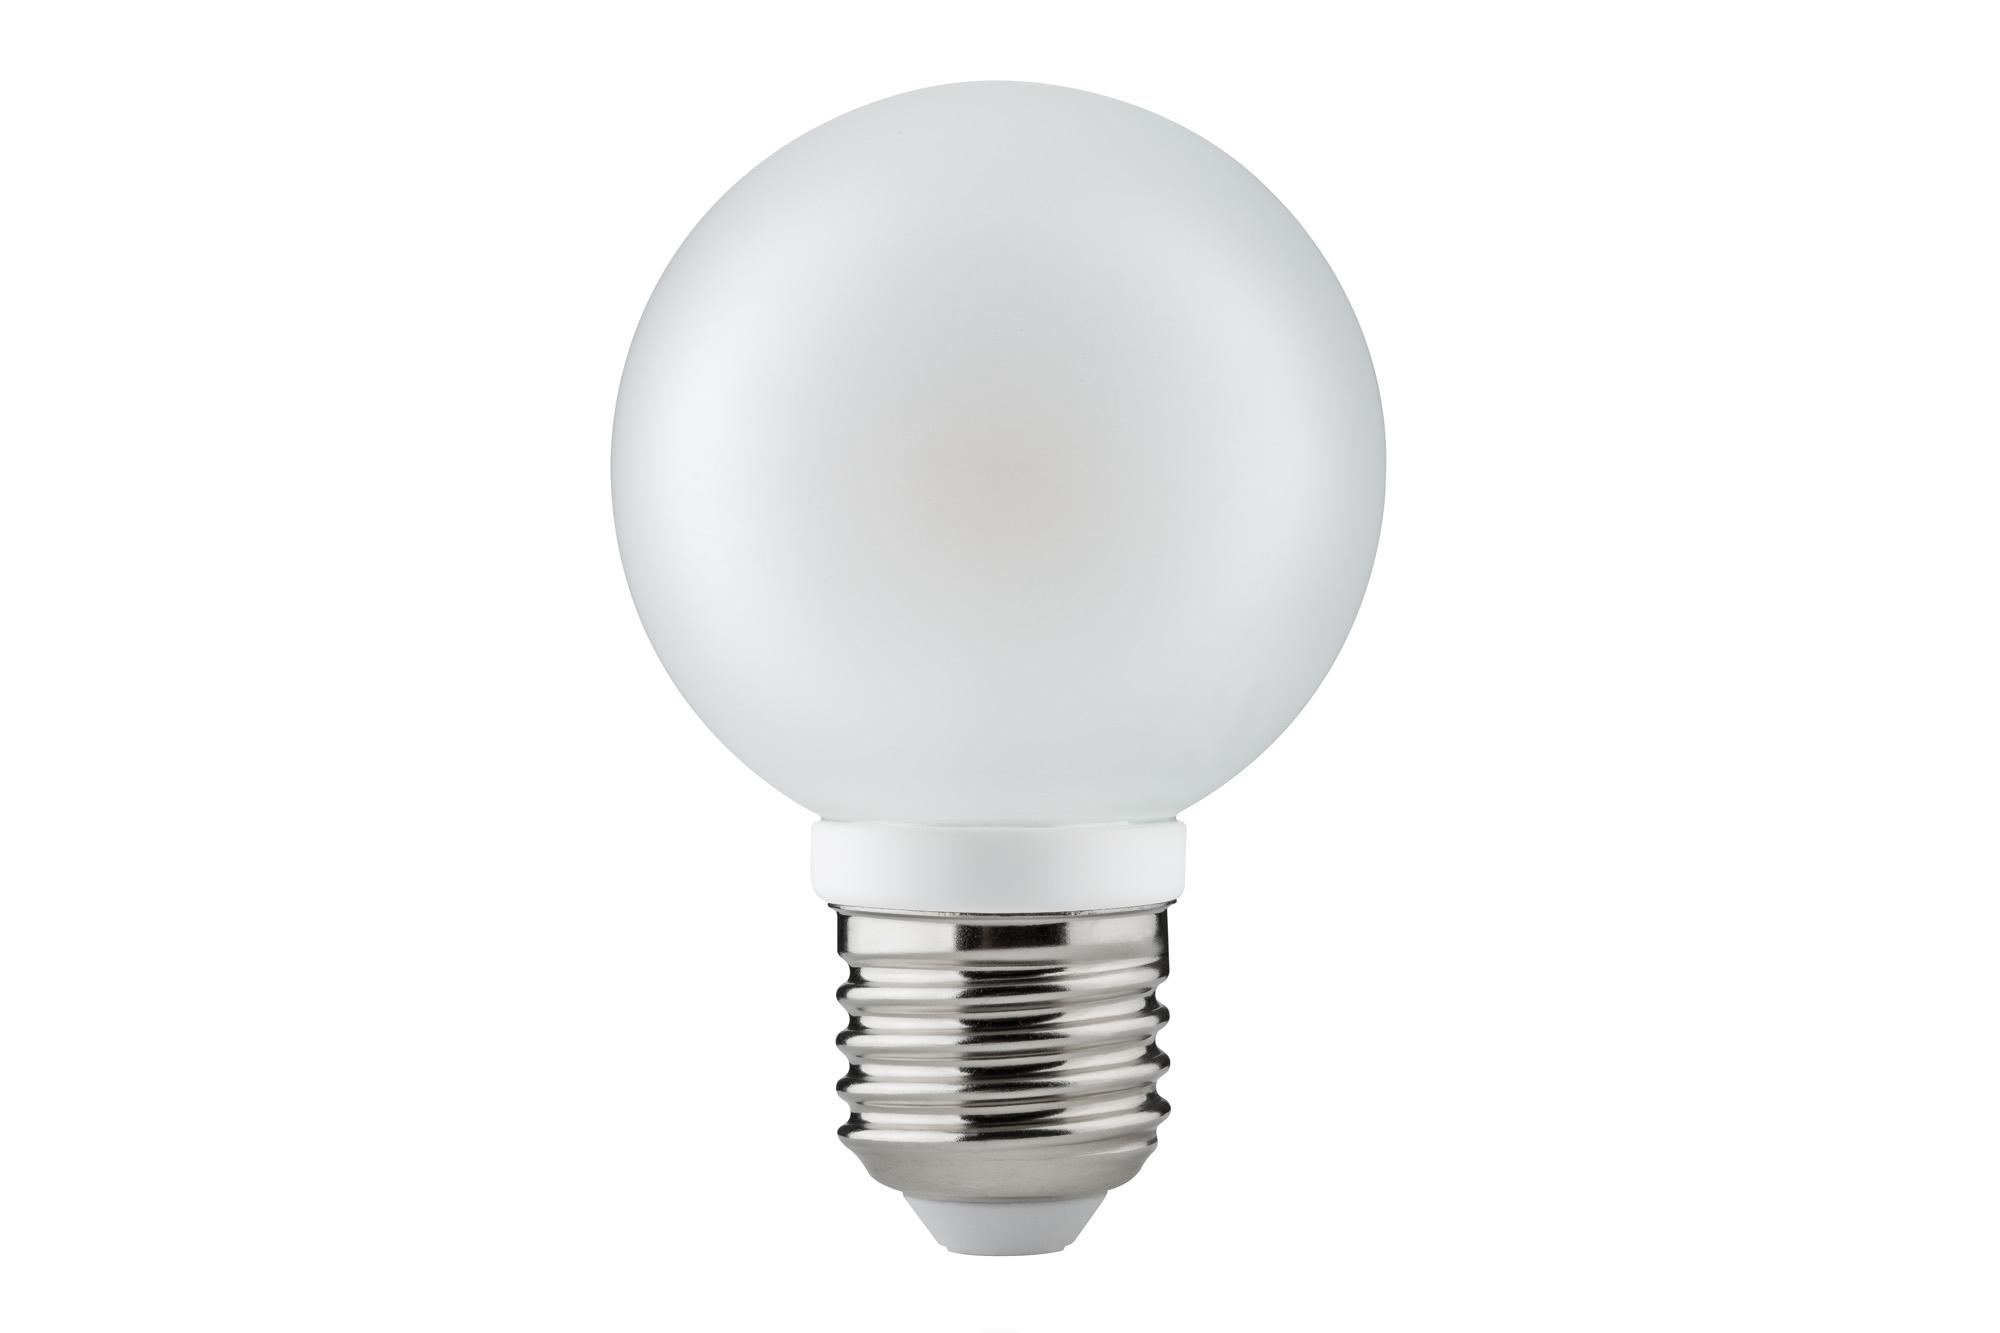 Paulmann. 28323 LED Globe 60 4W E27 Sat 2700K